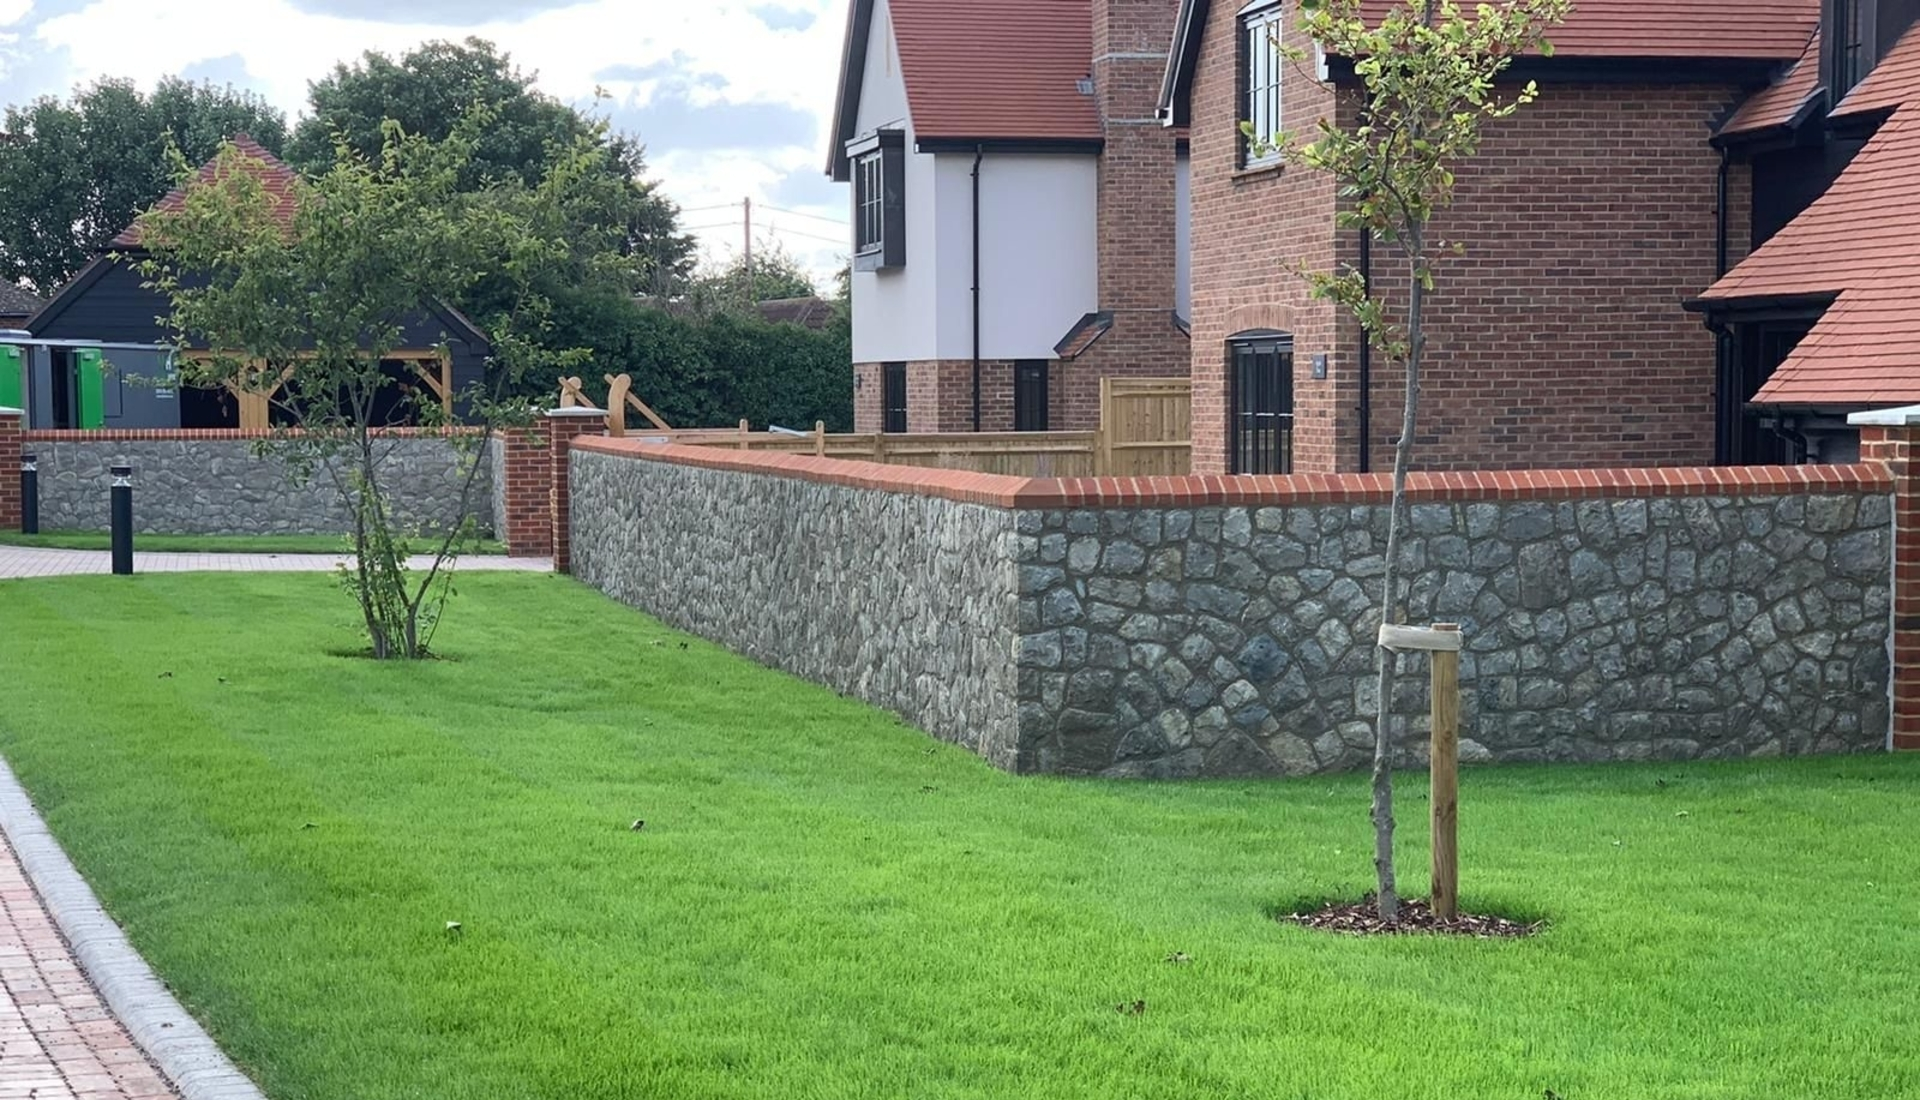 Kent Ragstone & Brickwork - Built in UK by Malling Masonry Stonework & Restoration Specialists in Kent